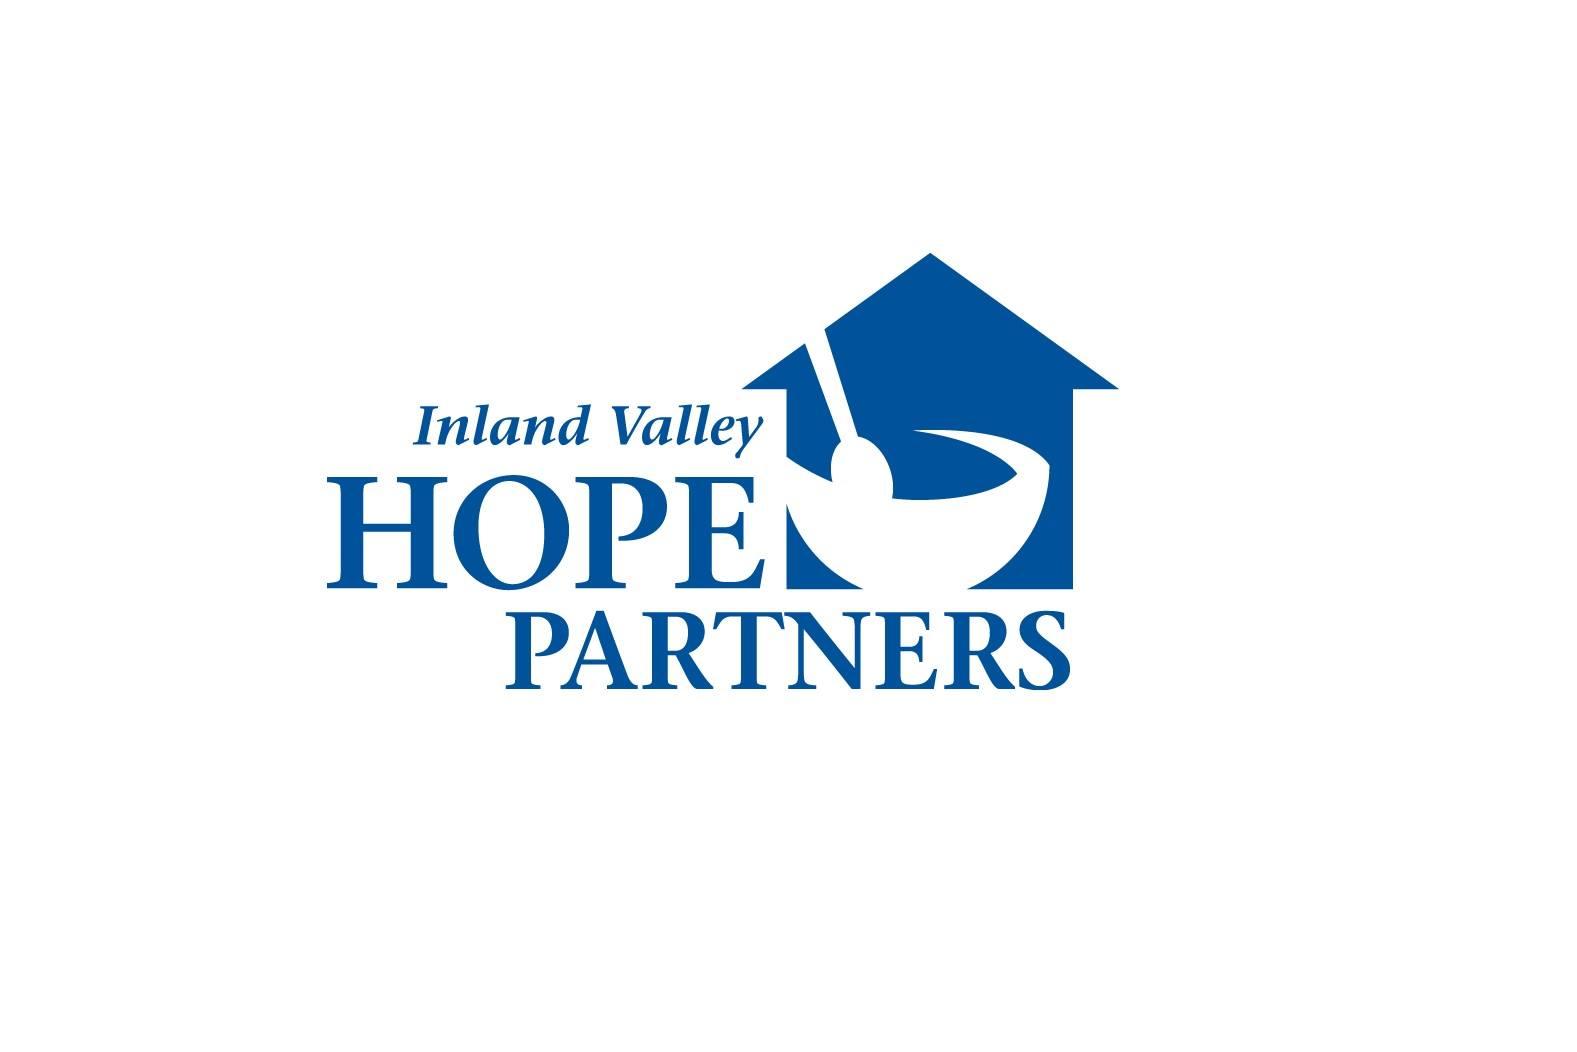 Inland Valley Hope Partners - Sova Program Center